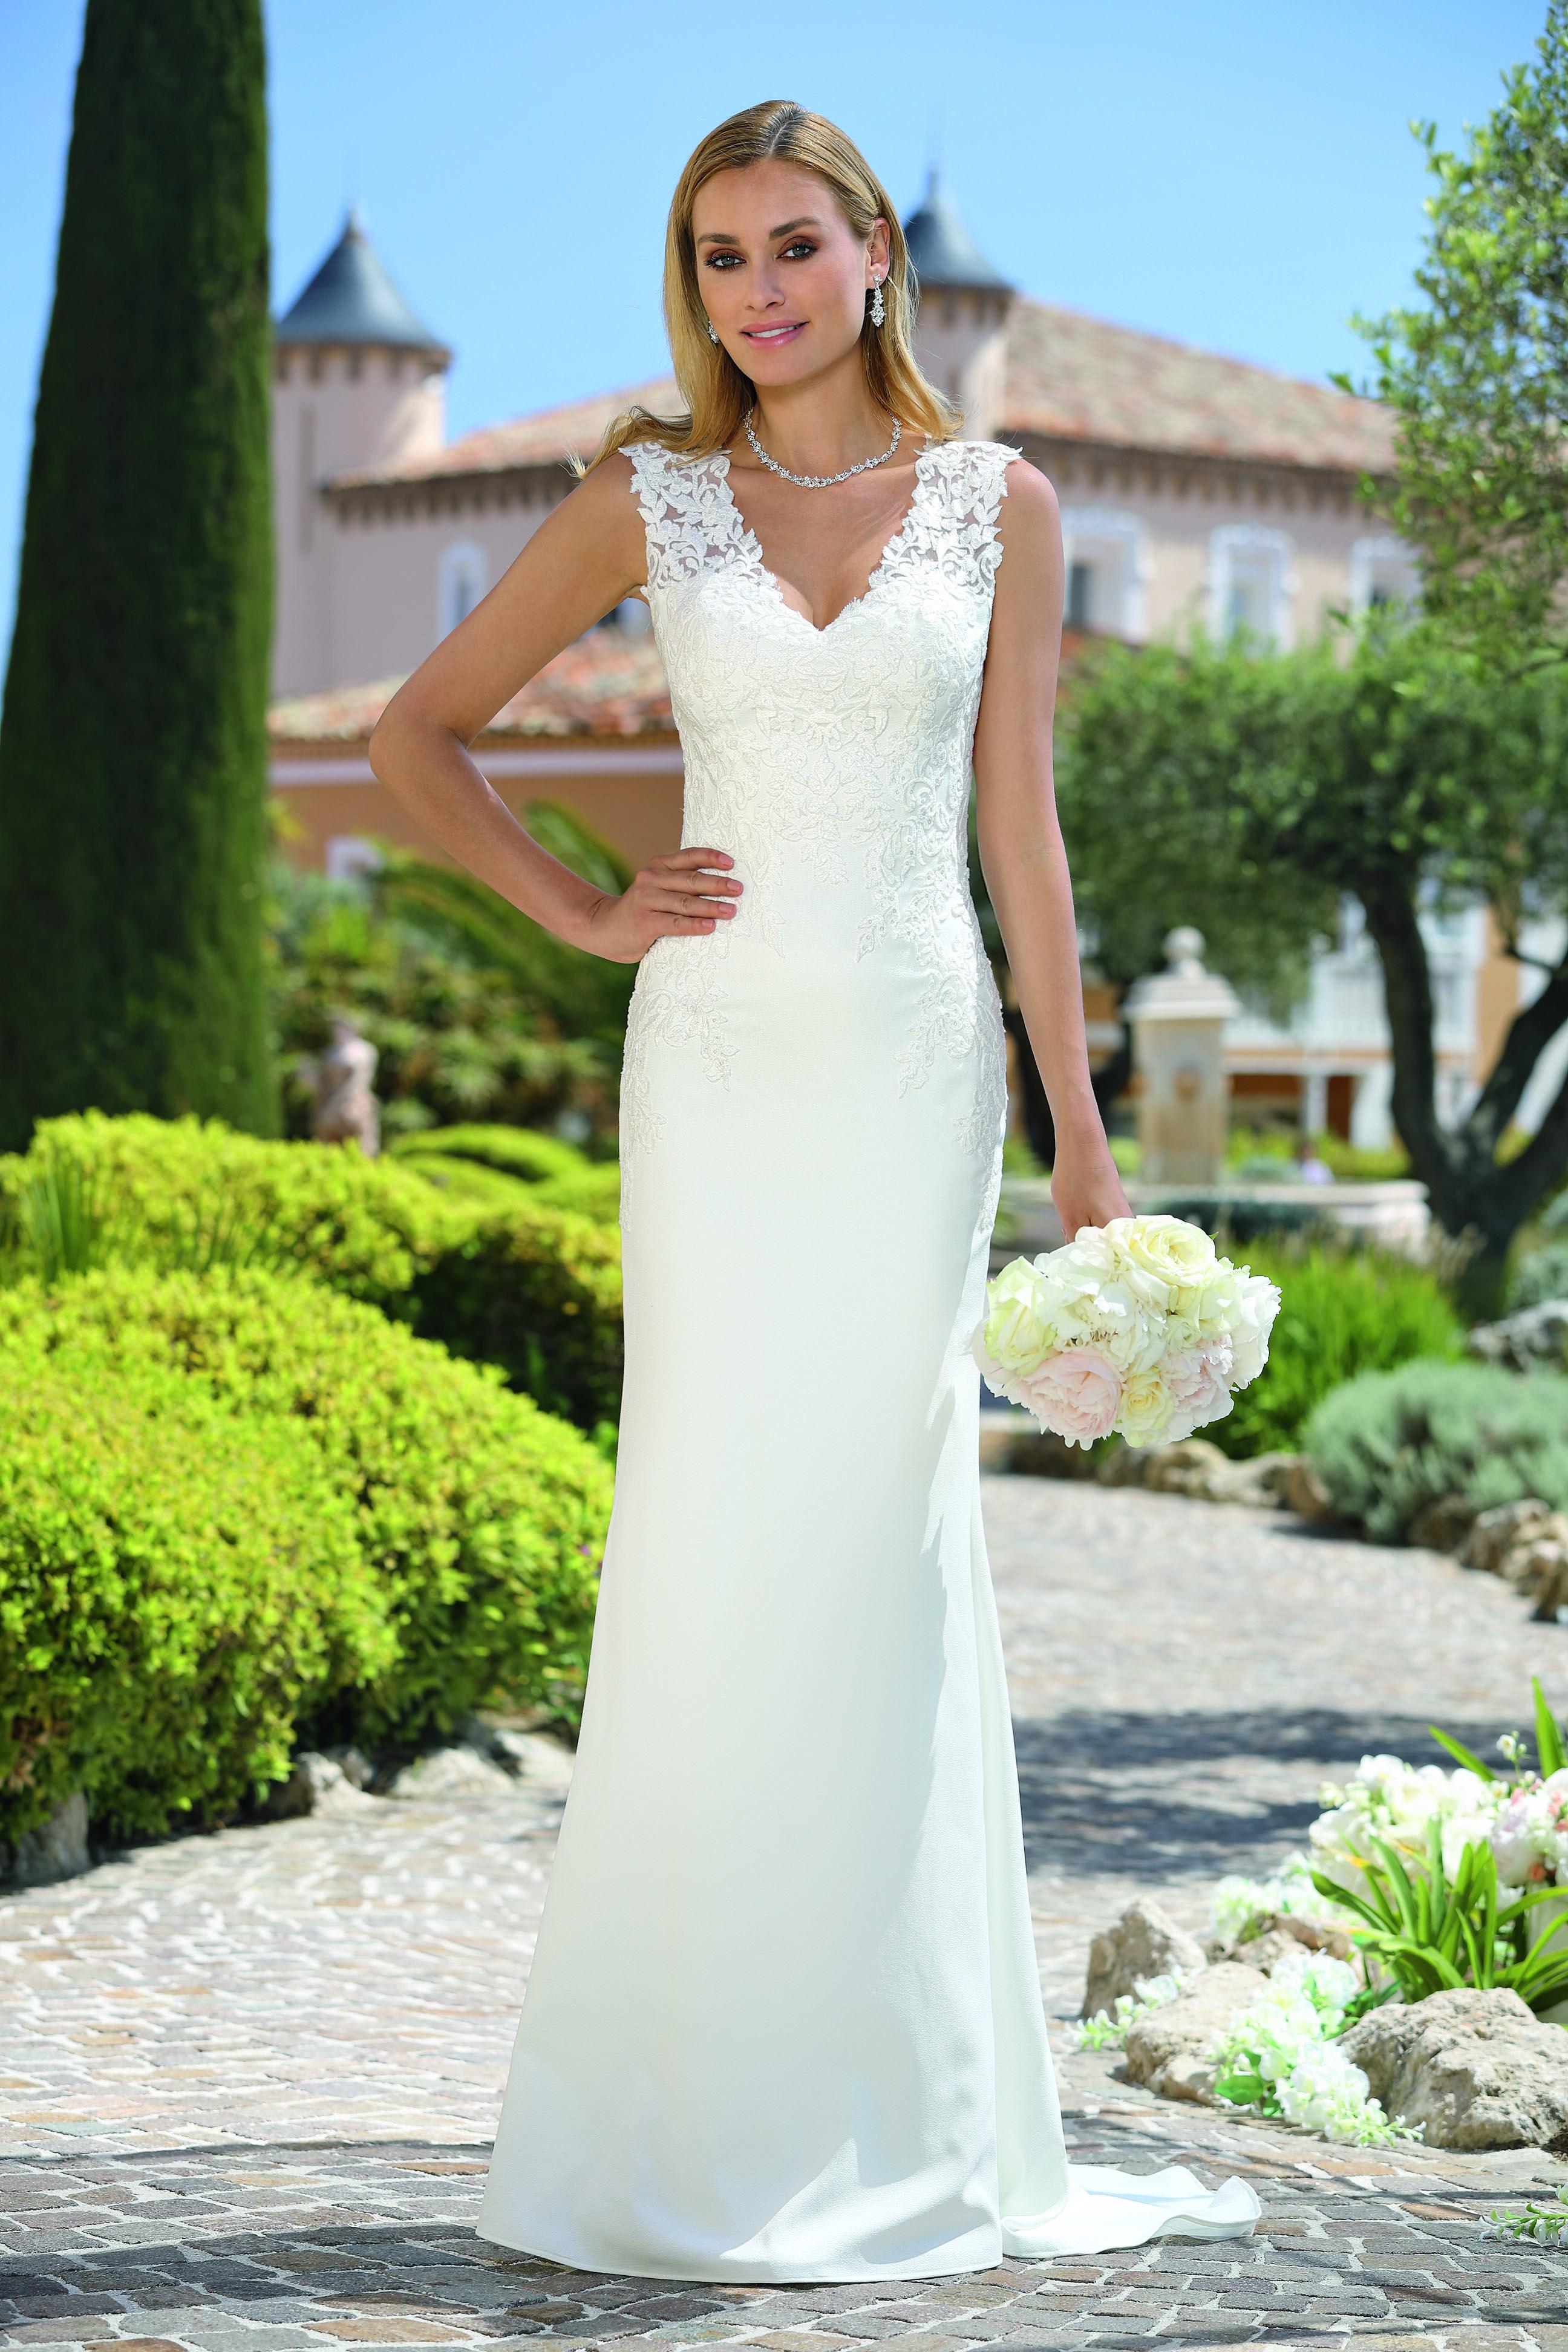 Ladybird Wedding Dress Trouwjurk Bruidsjurk Boho